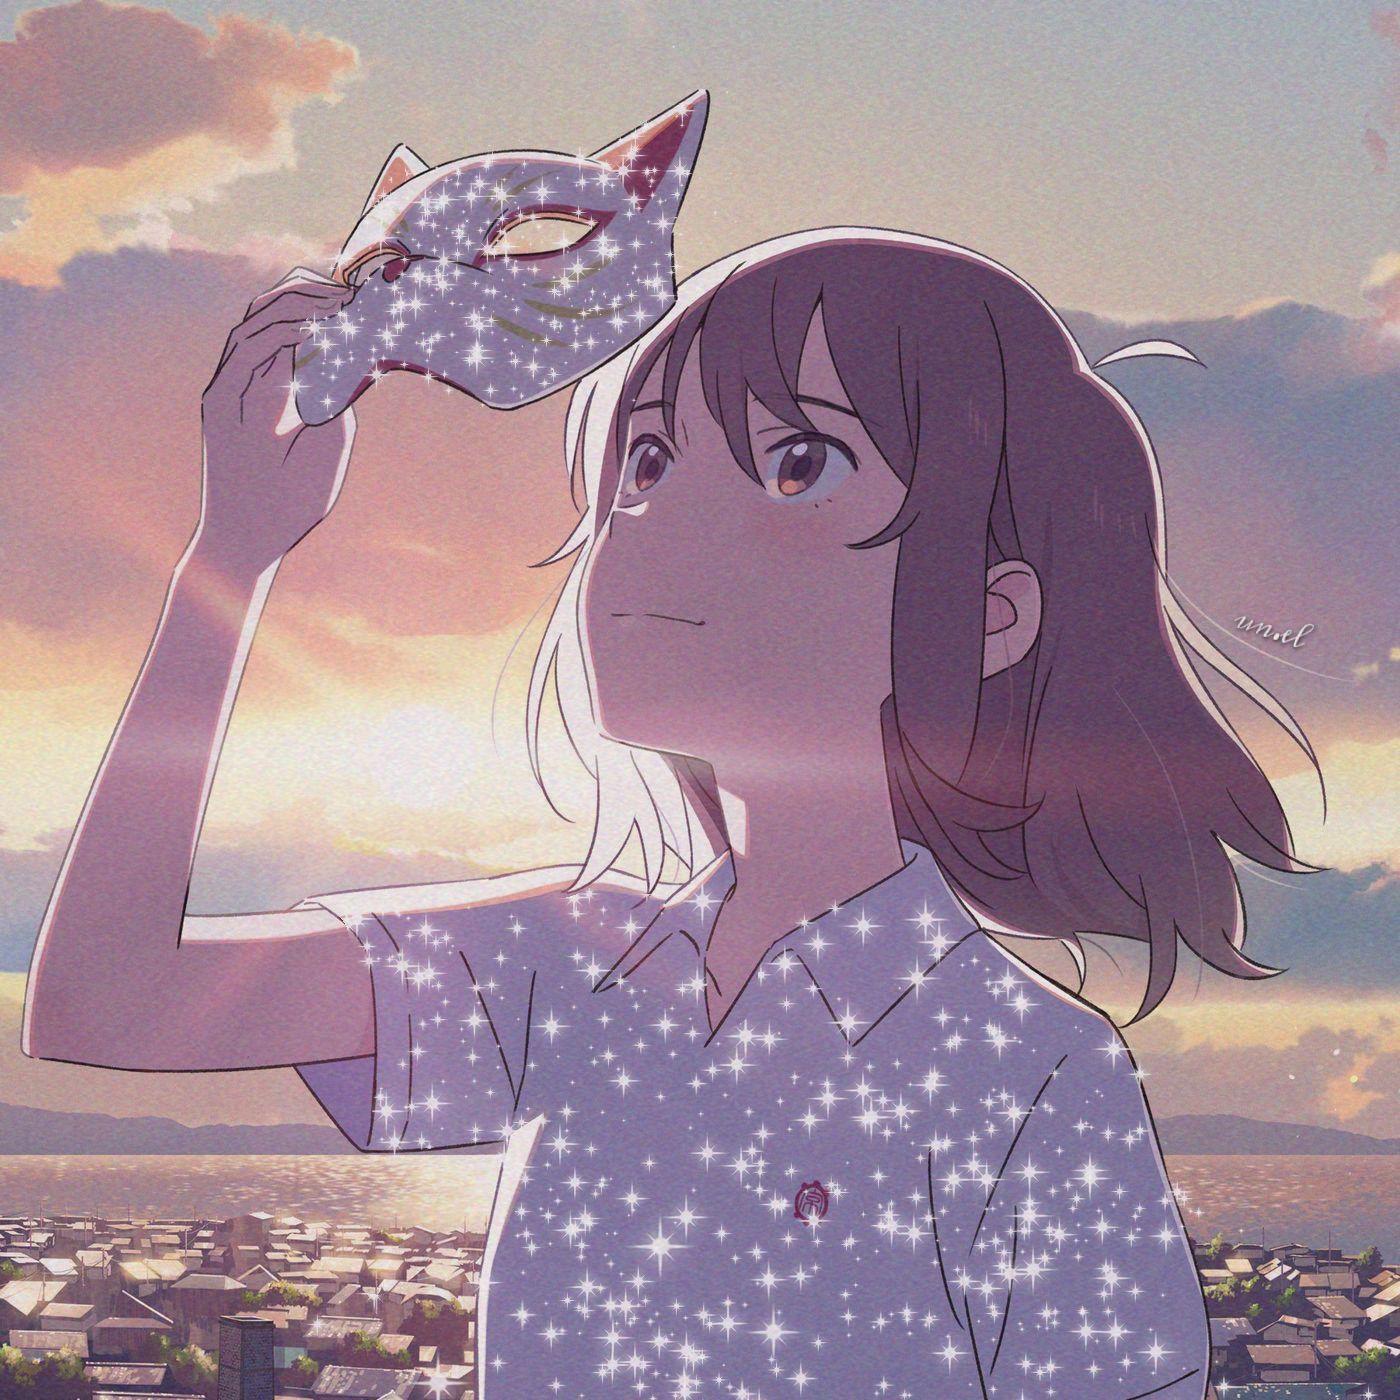 Miyo Sasaki Anime Aesthetic Icons Em 2020 Amor De Gato Olho De Gatinho Anime Icons